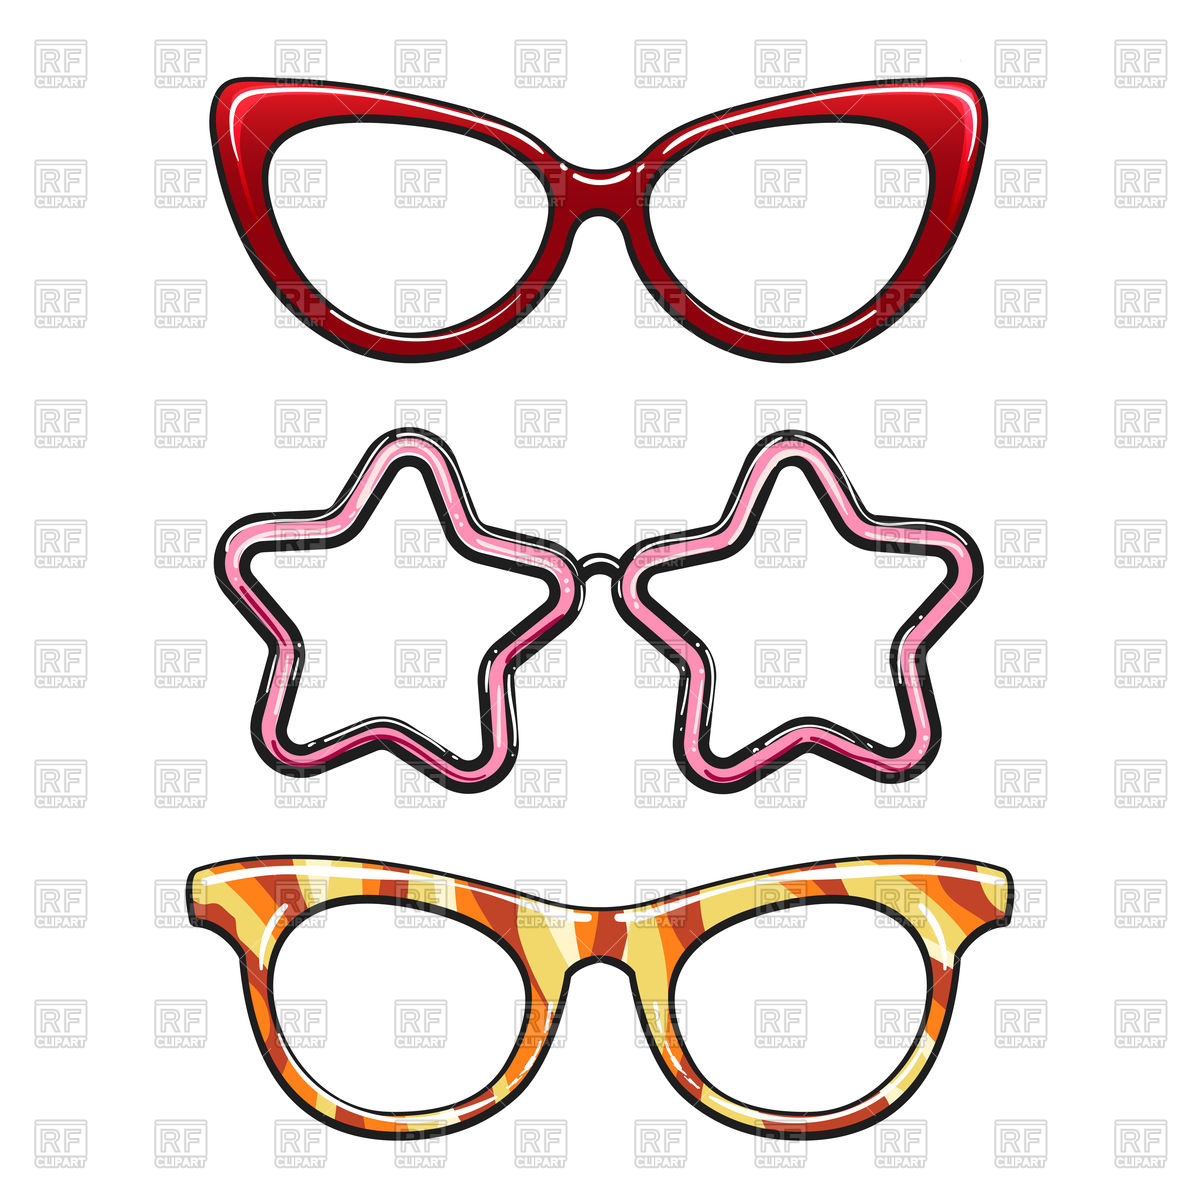 1200x1200 Colorful Hipster Eyeglasses Set On White Background Royalty Free